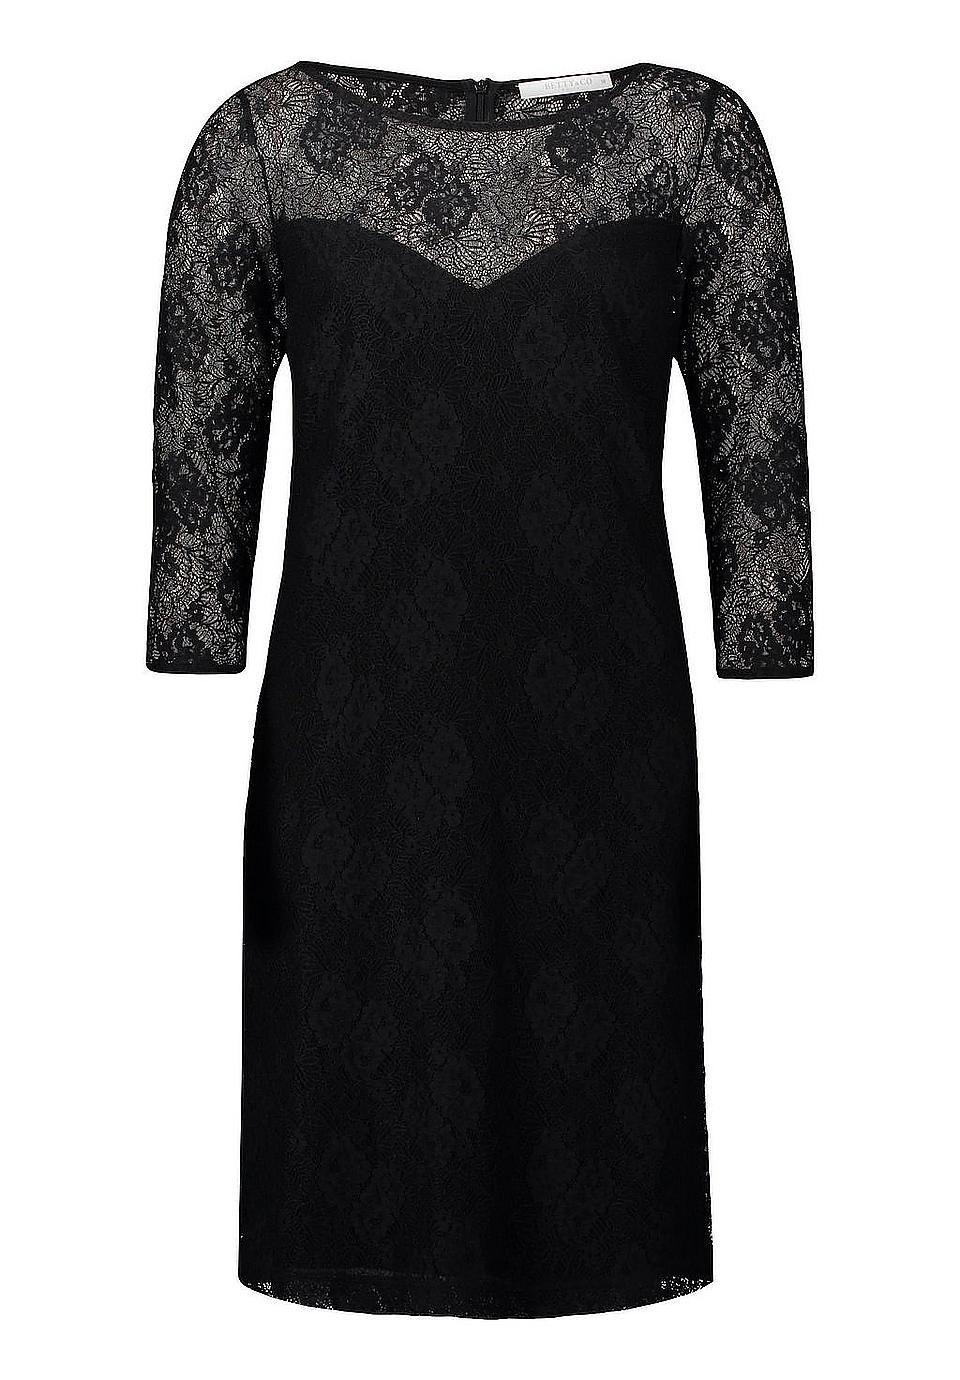 Betty&Co Spitzenkleid tailliert Silvester Outfit #silvesteroutfitdamen